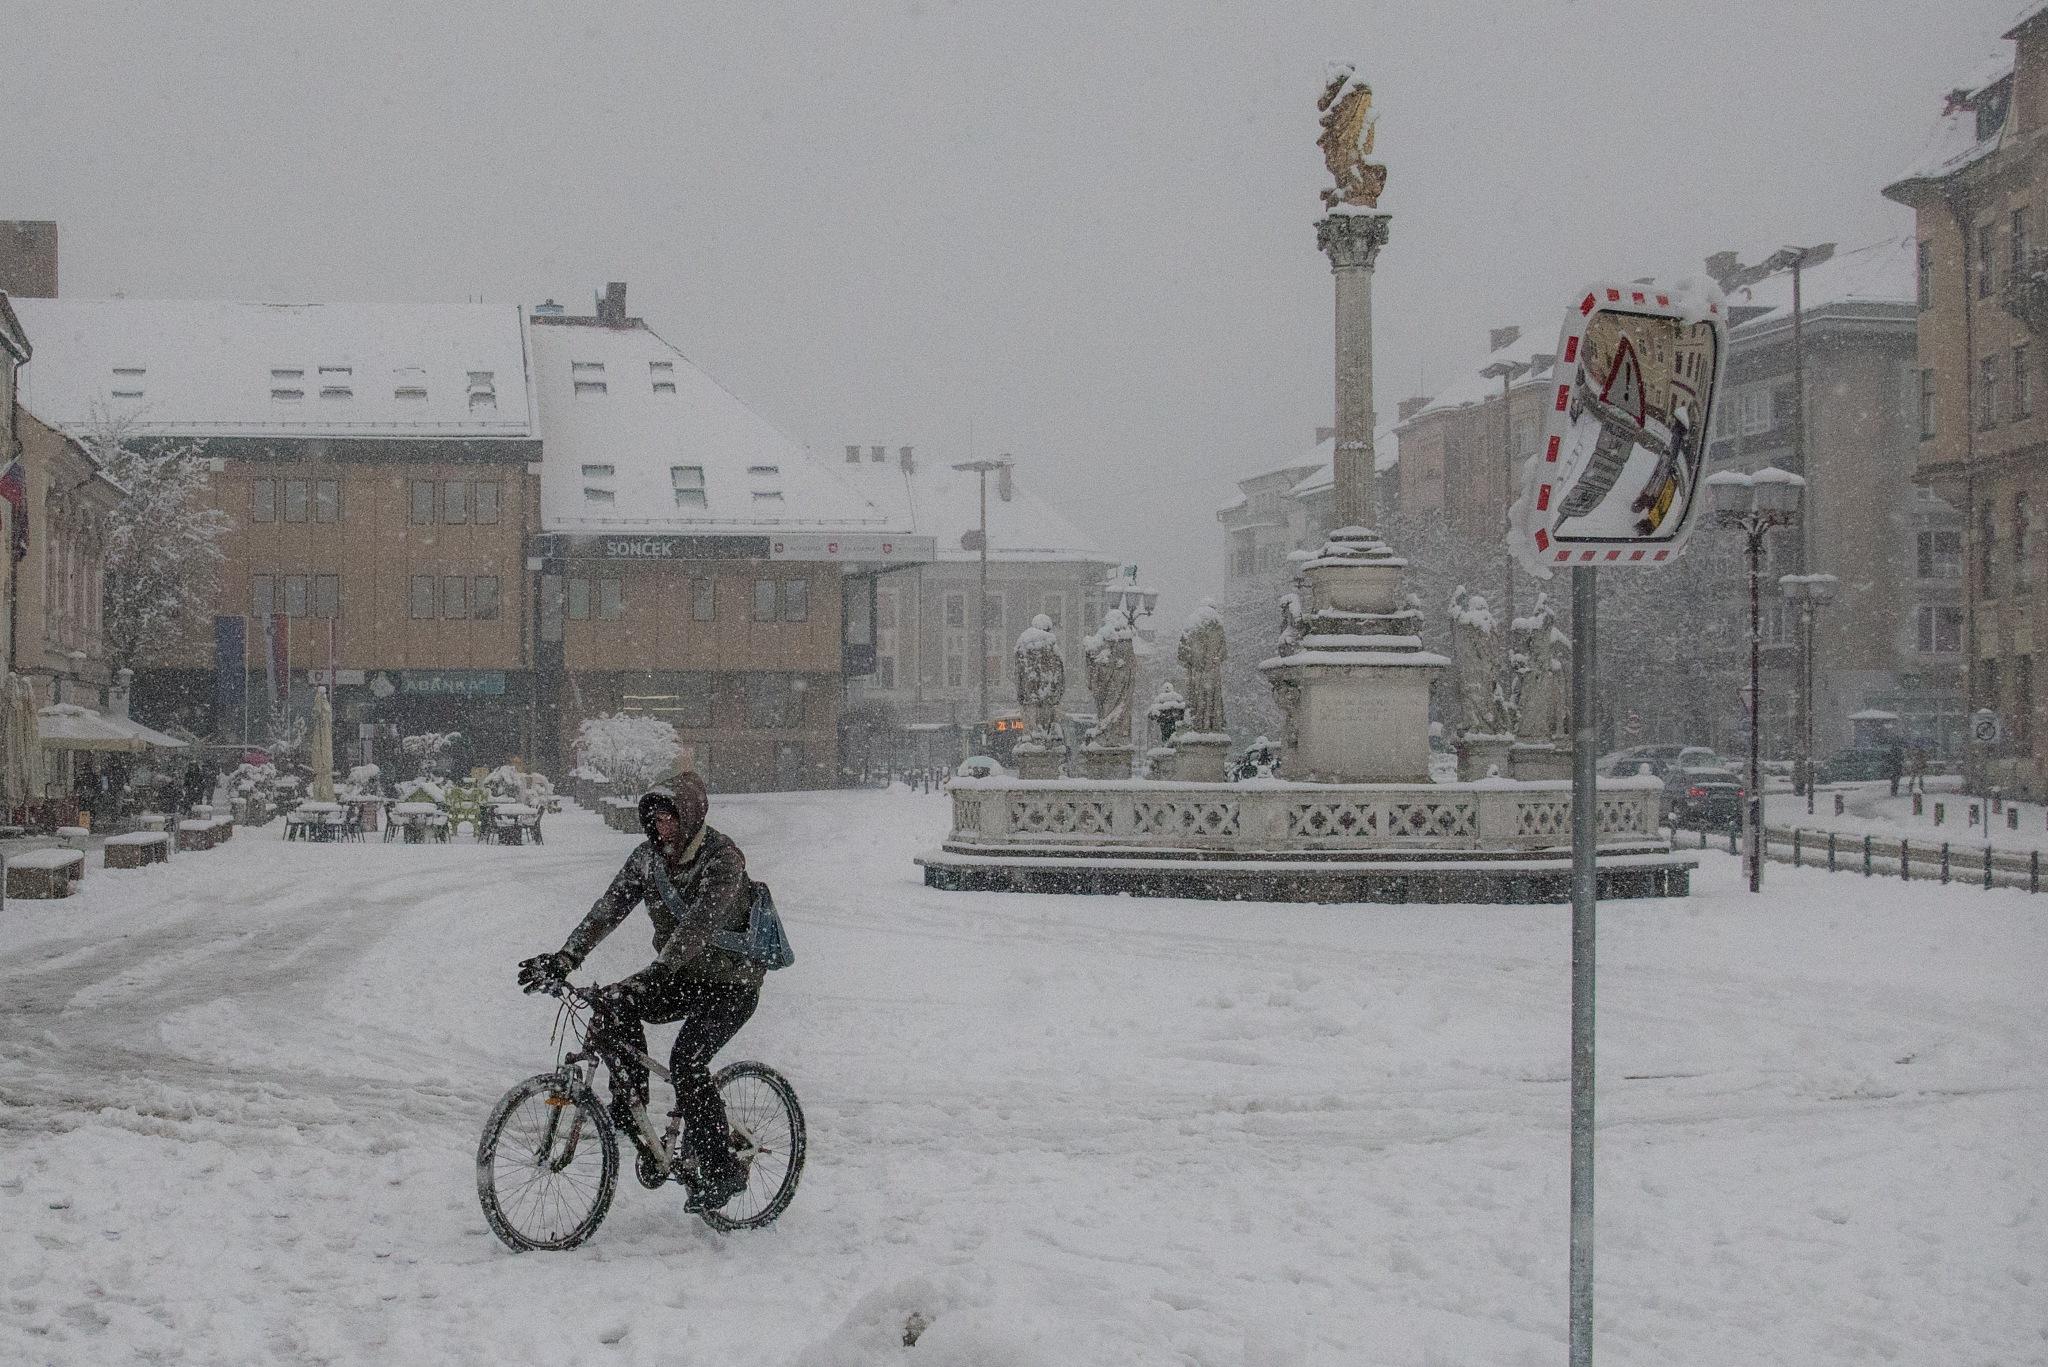 snowing by dusanvladimir